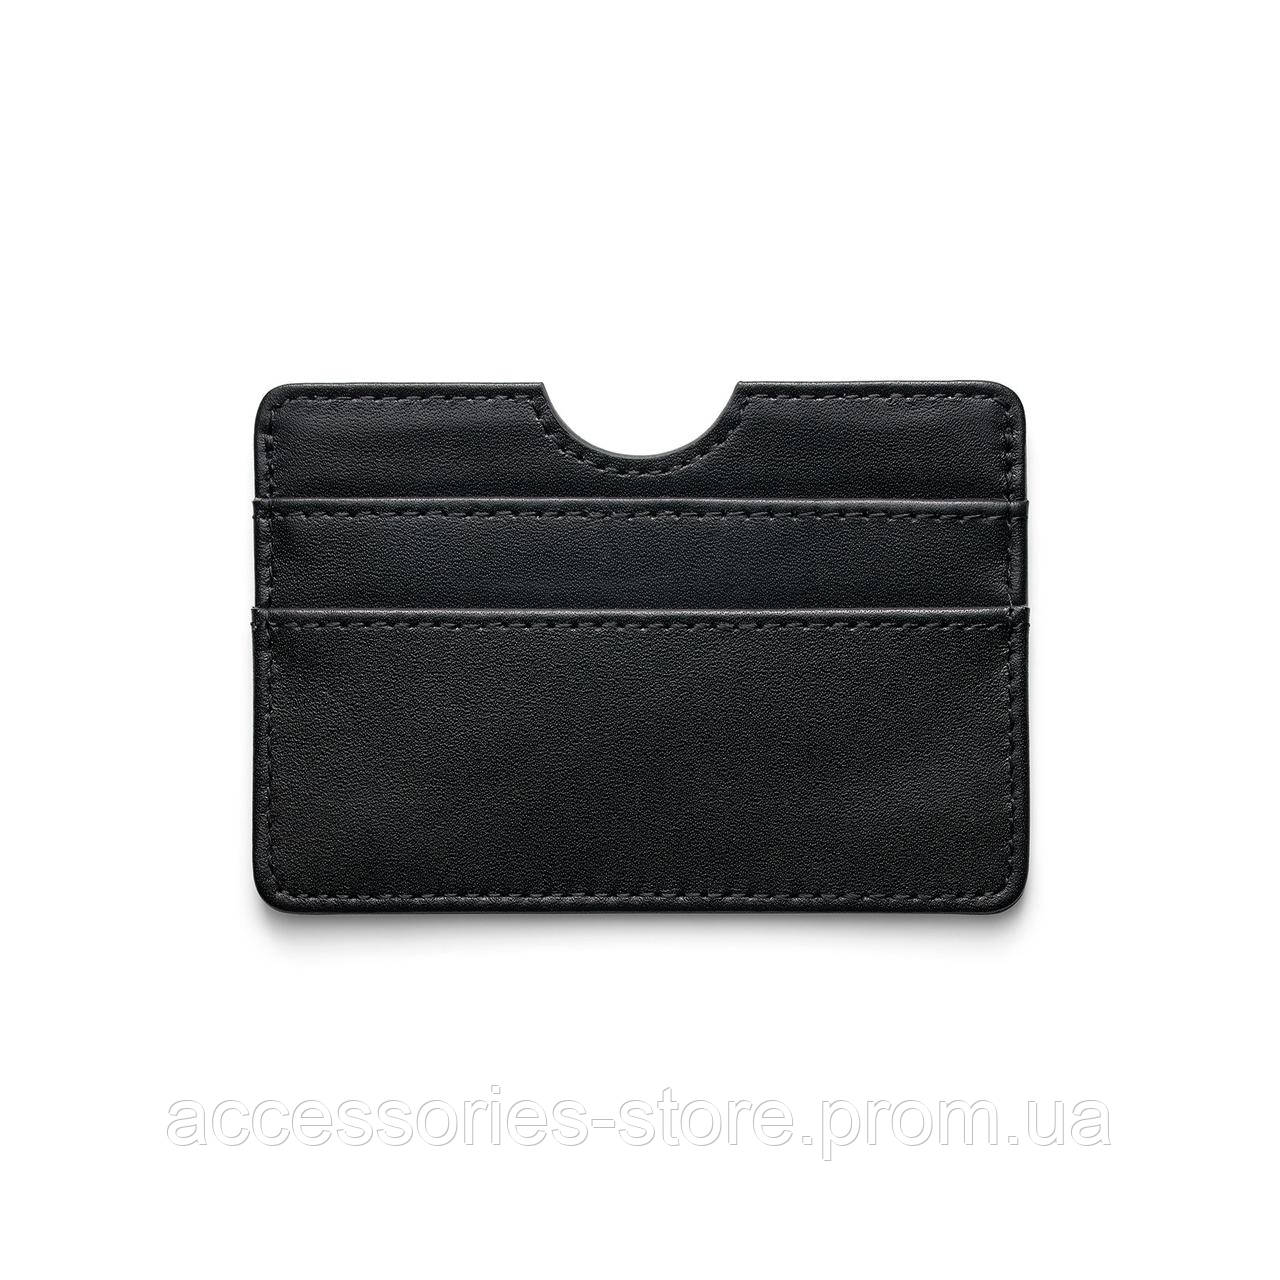 Визитница Volvo Classic Leather Card Holder